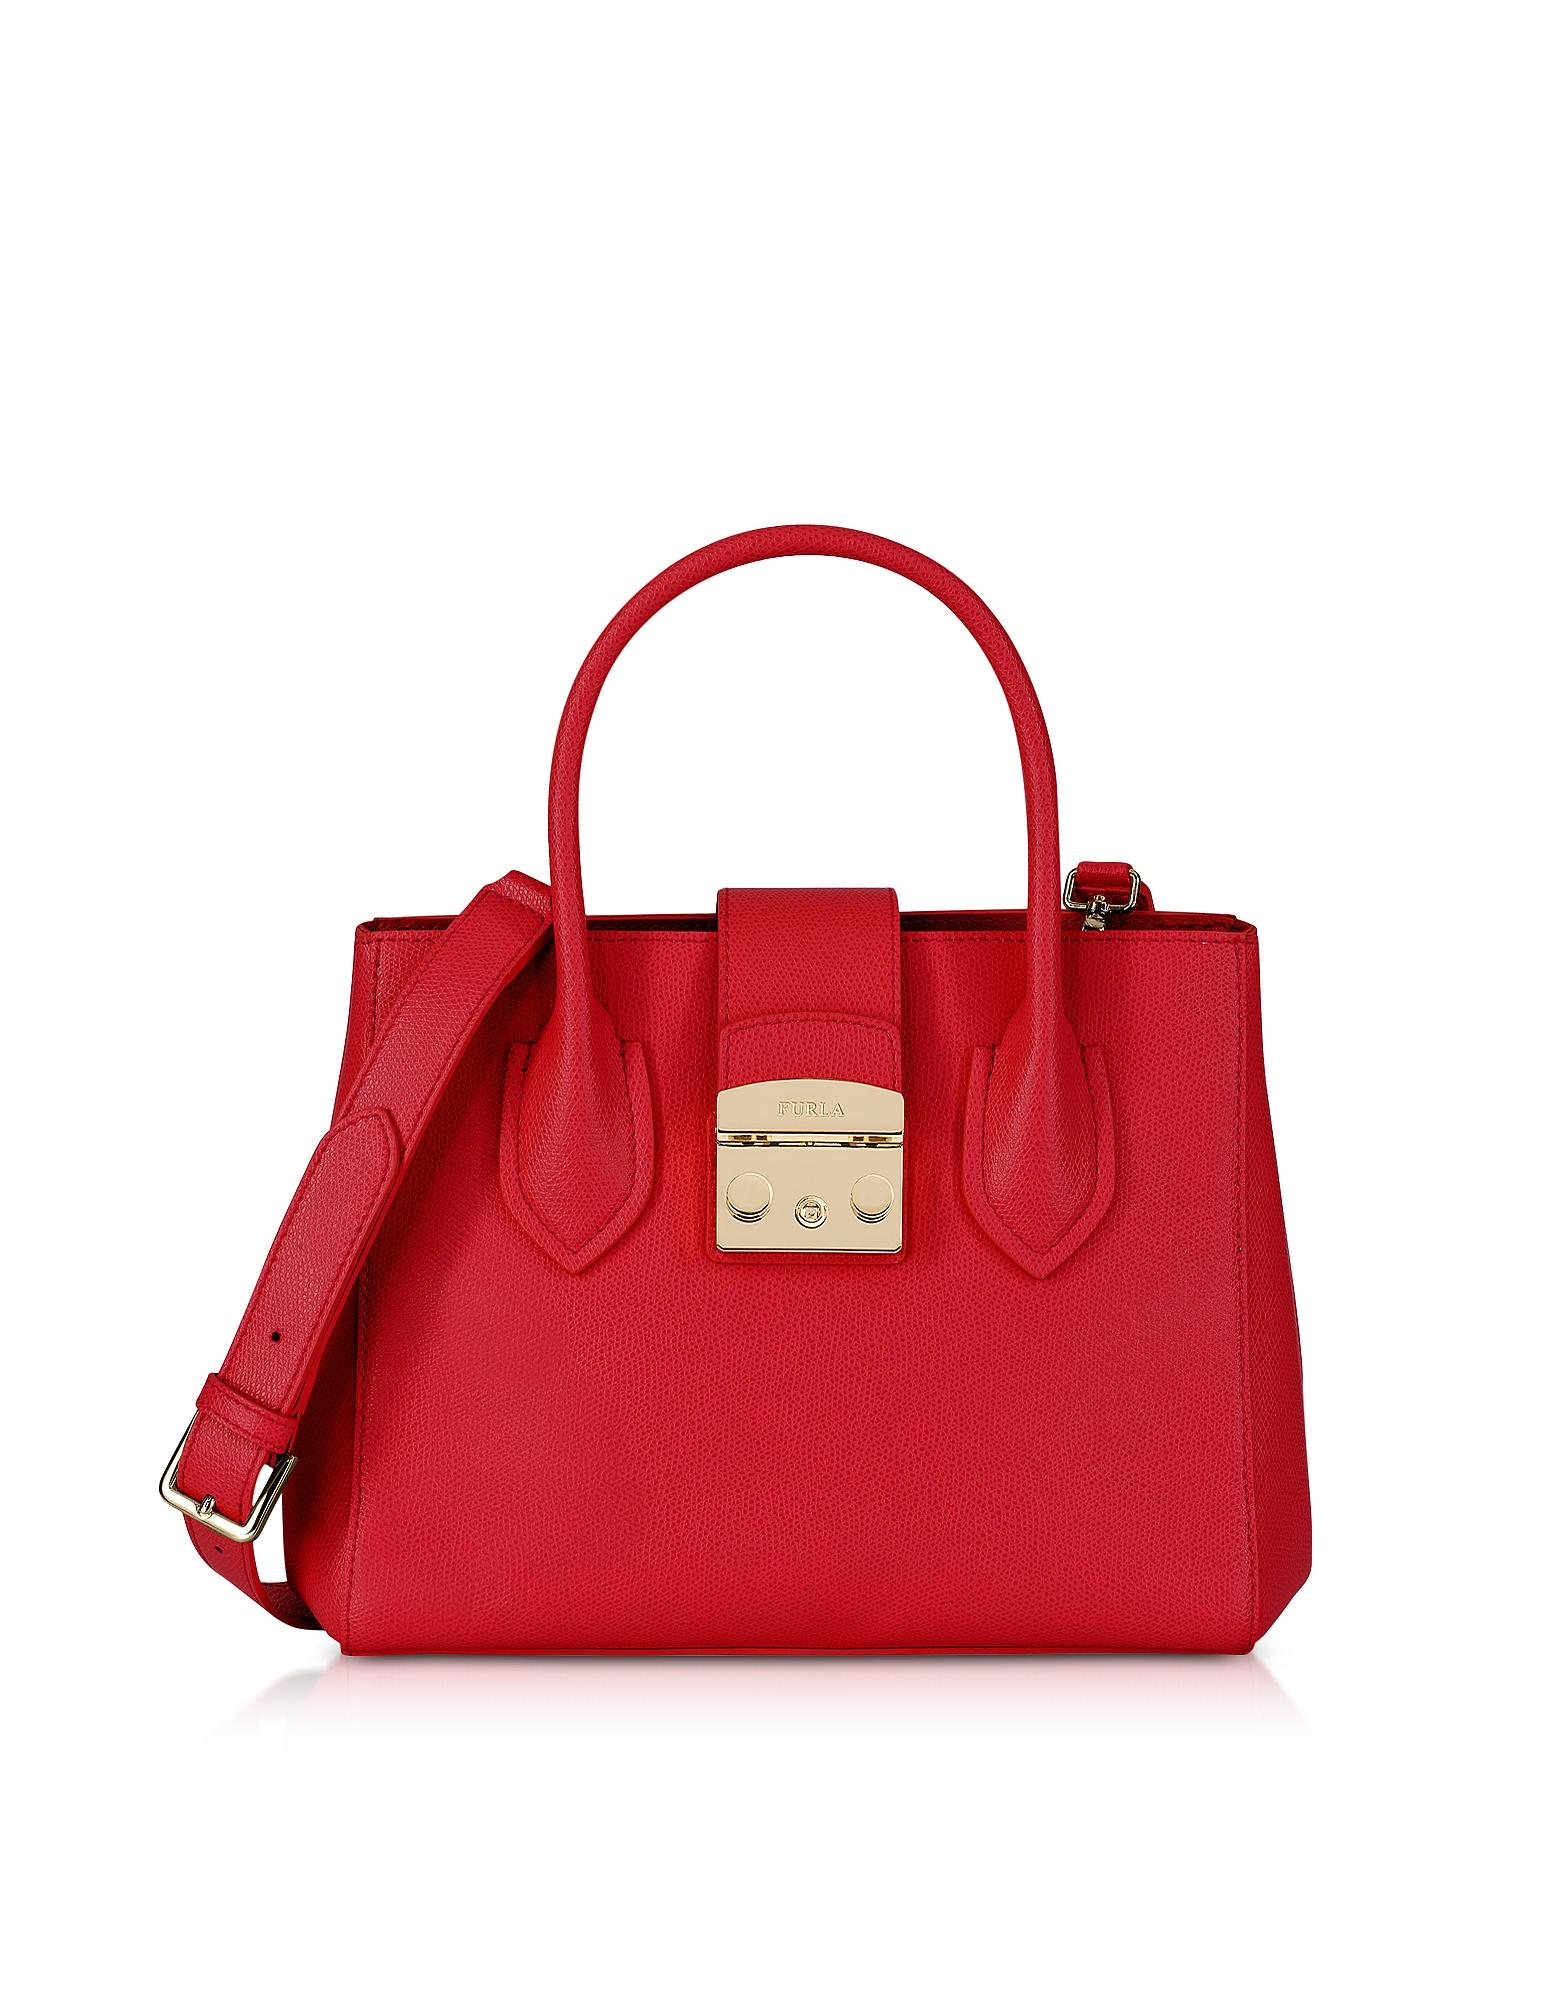 Furla Handbags, Ruby Leather Metropolis Small Tote Bag